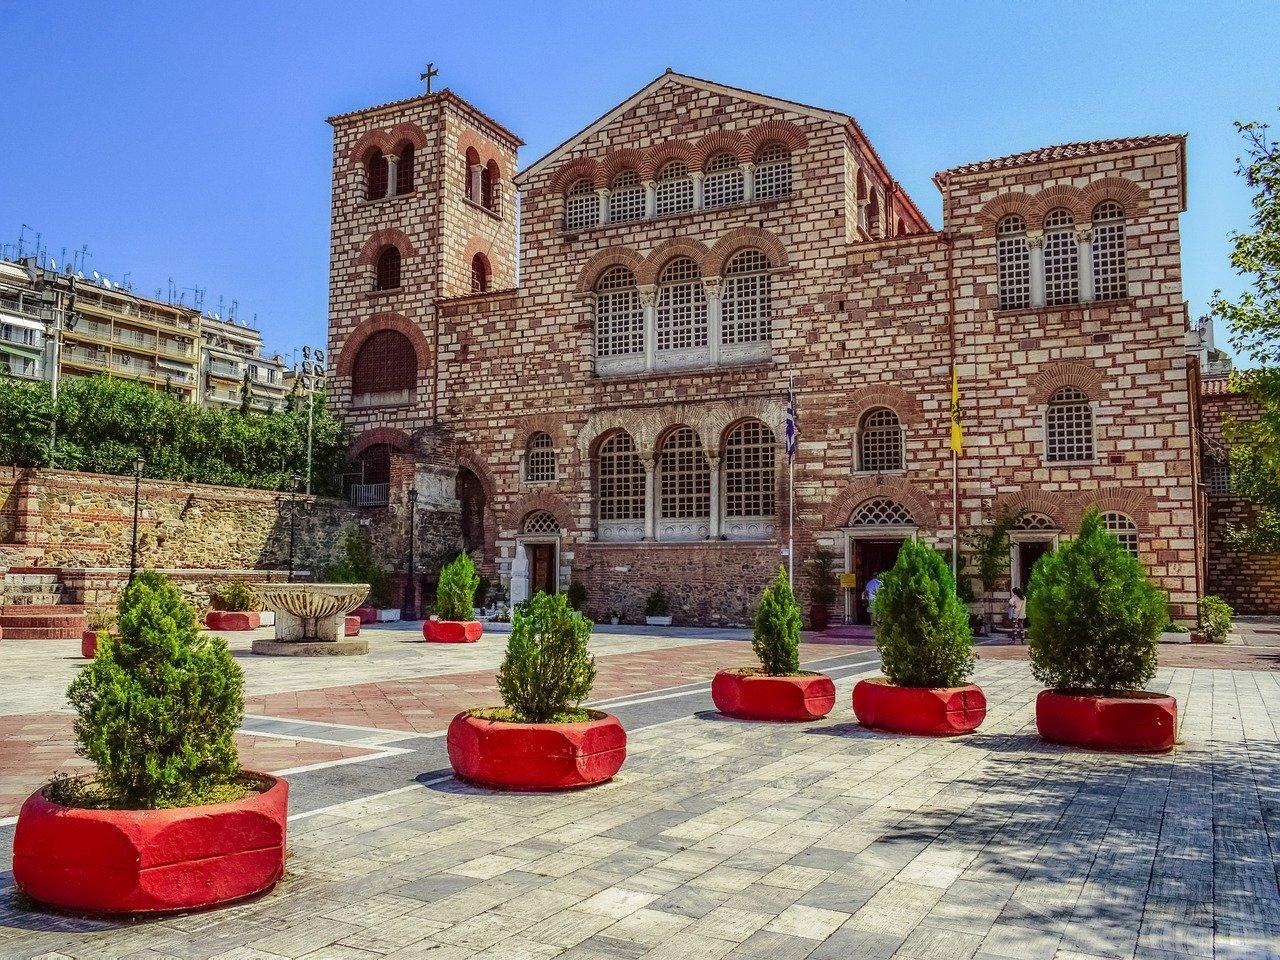 Thessaloniki Cathedral - St. Demetrius